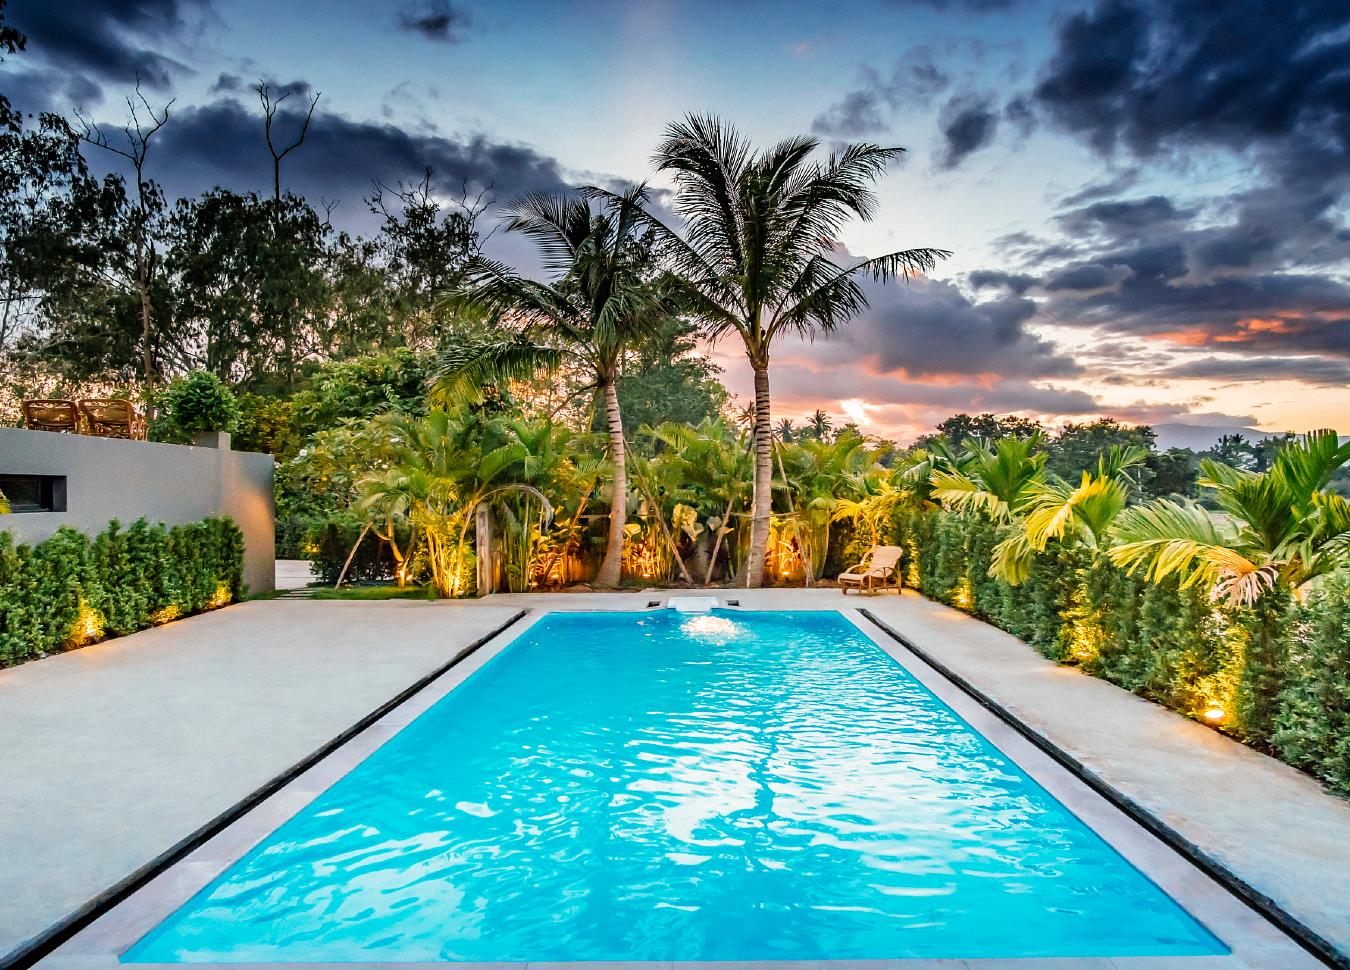 Chiang Mai Luxury Private Pool Villa _ Main Header Slideshow _ MOBILE 02